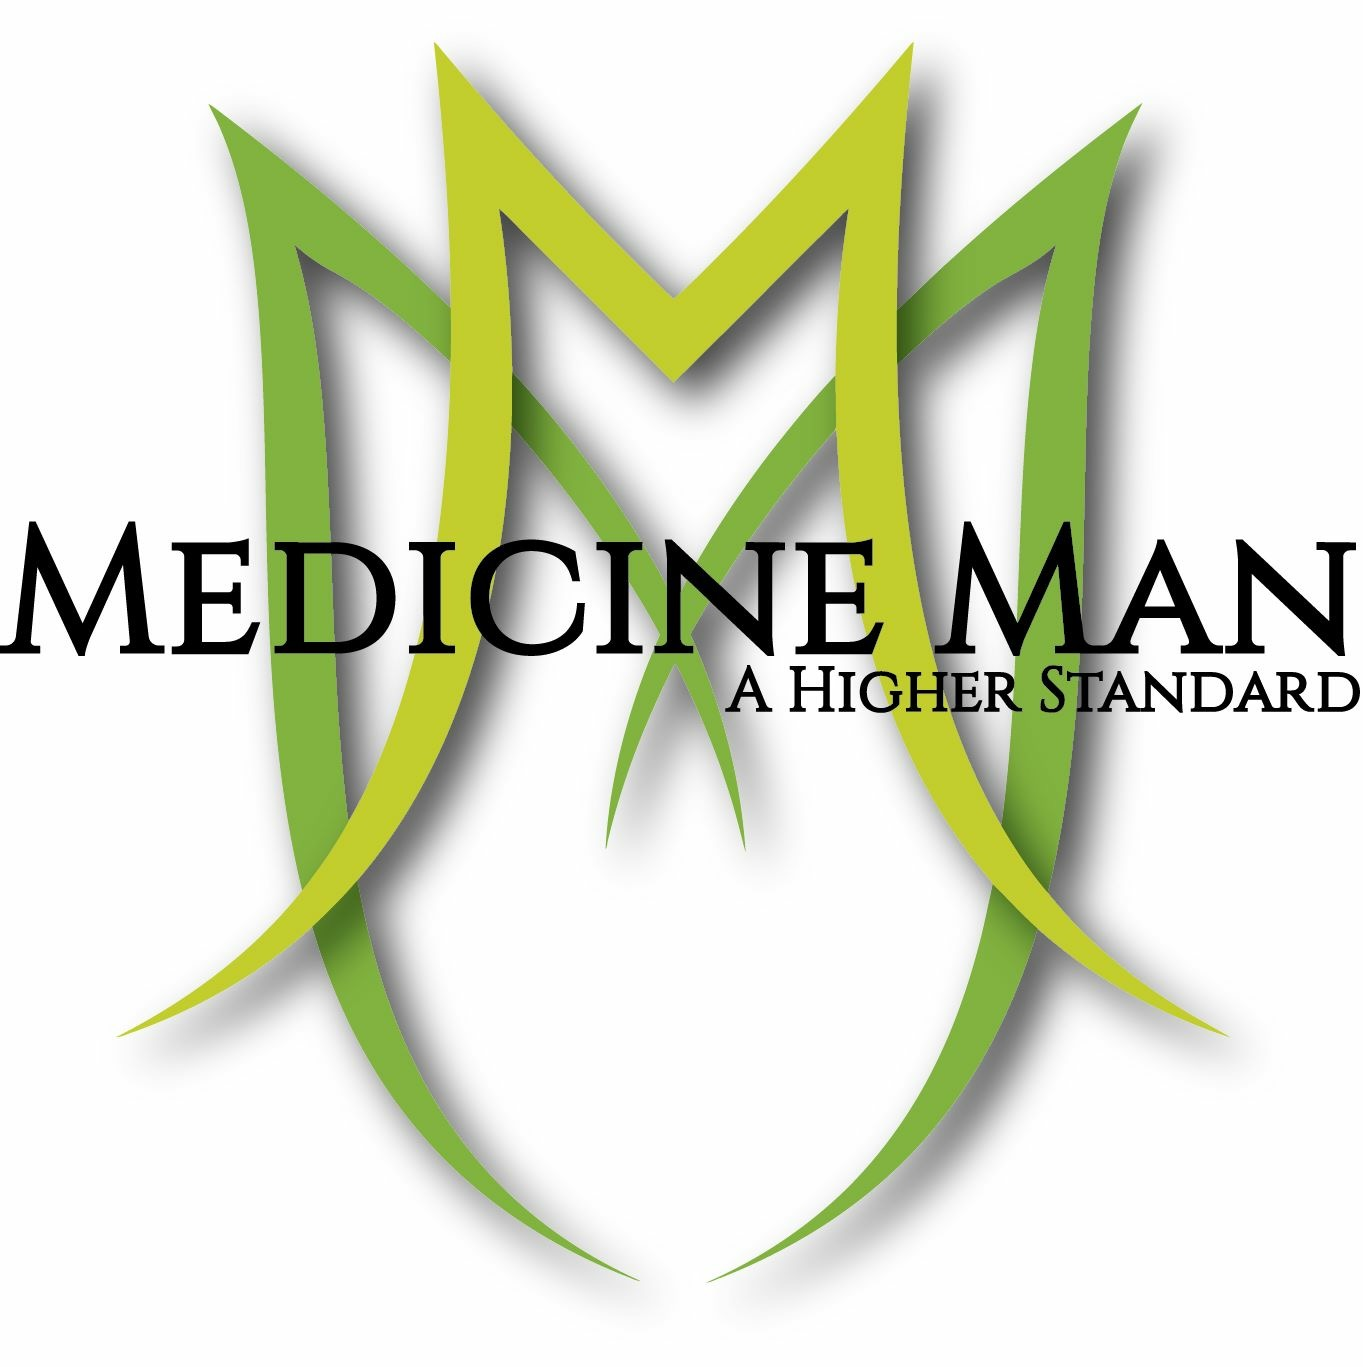 medicineman.JPG